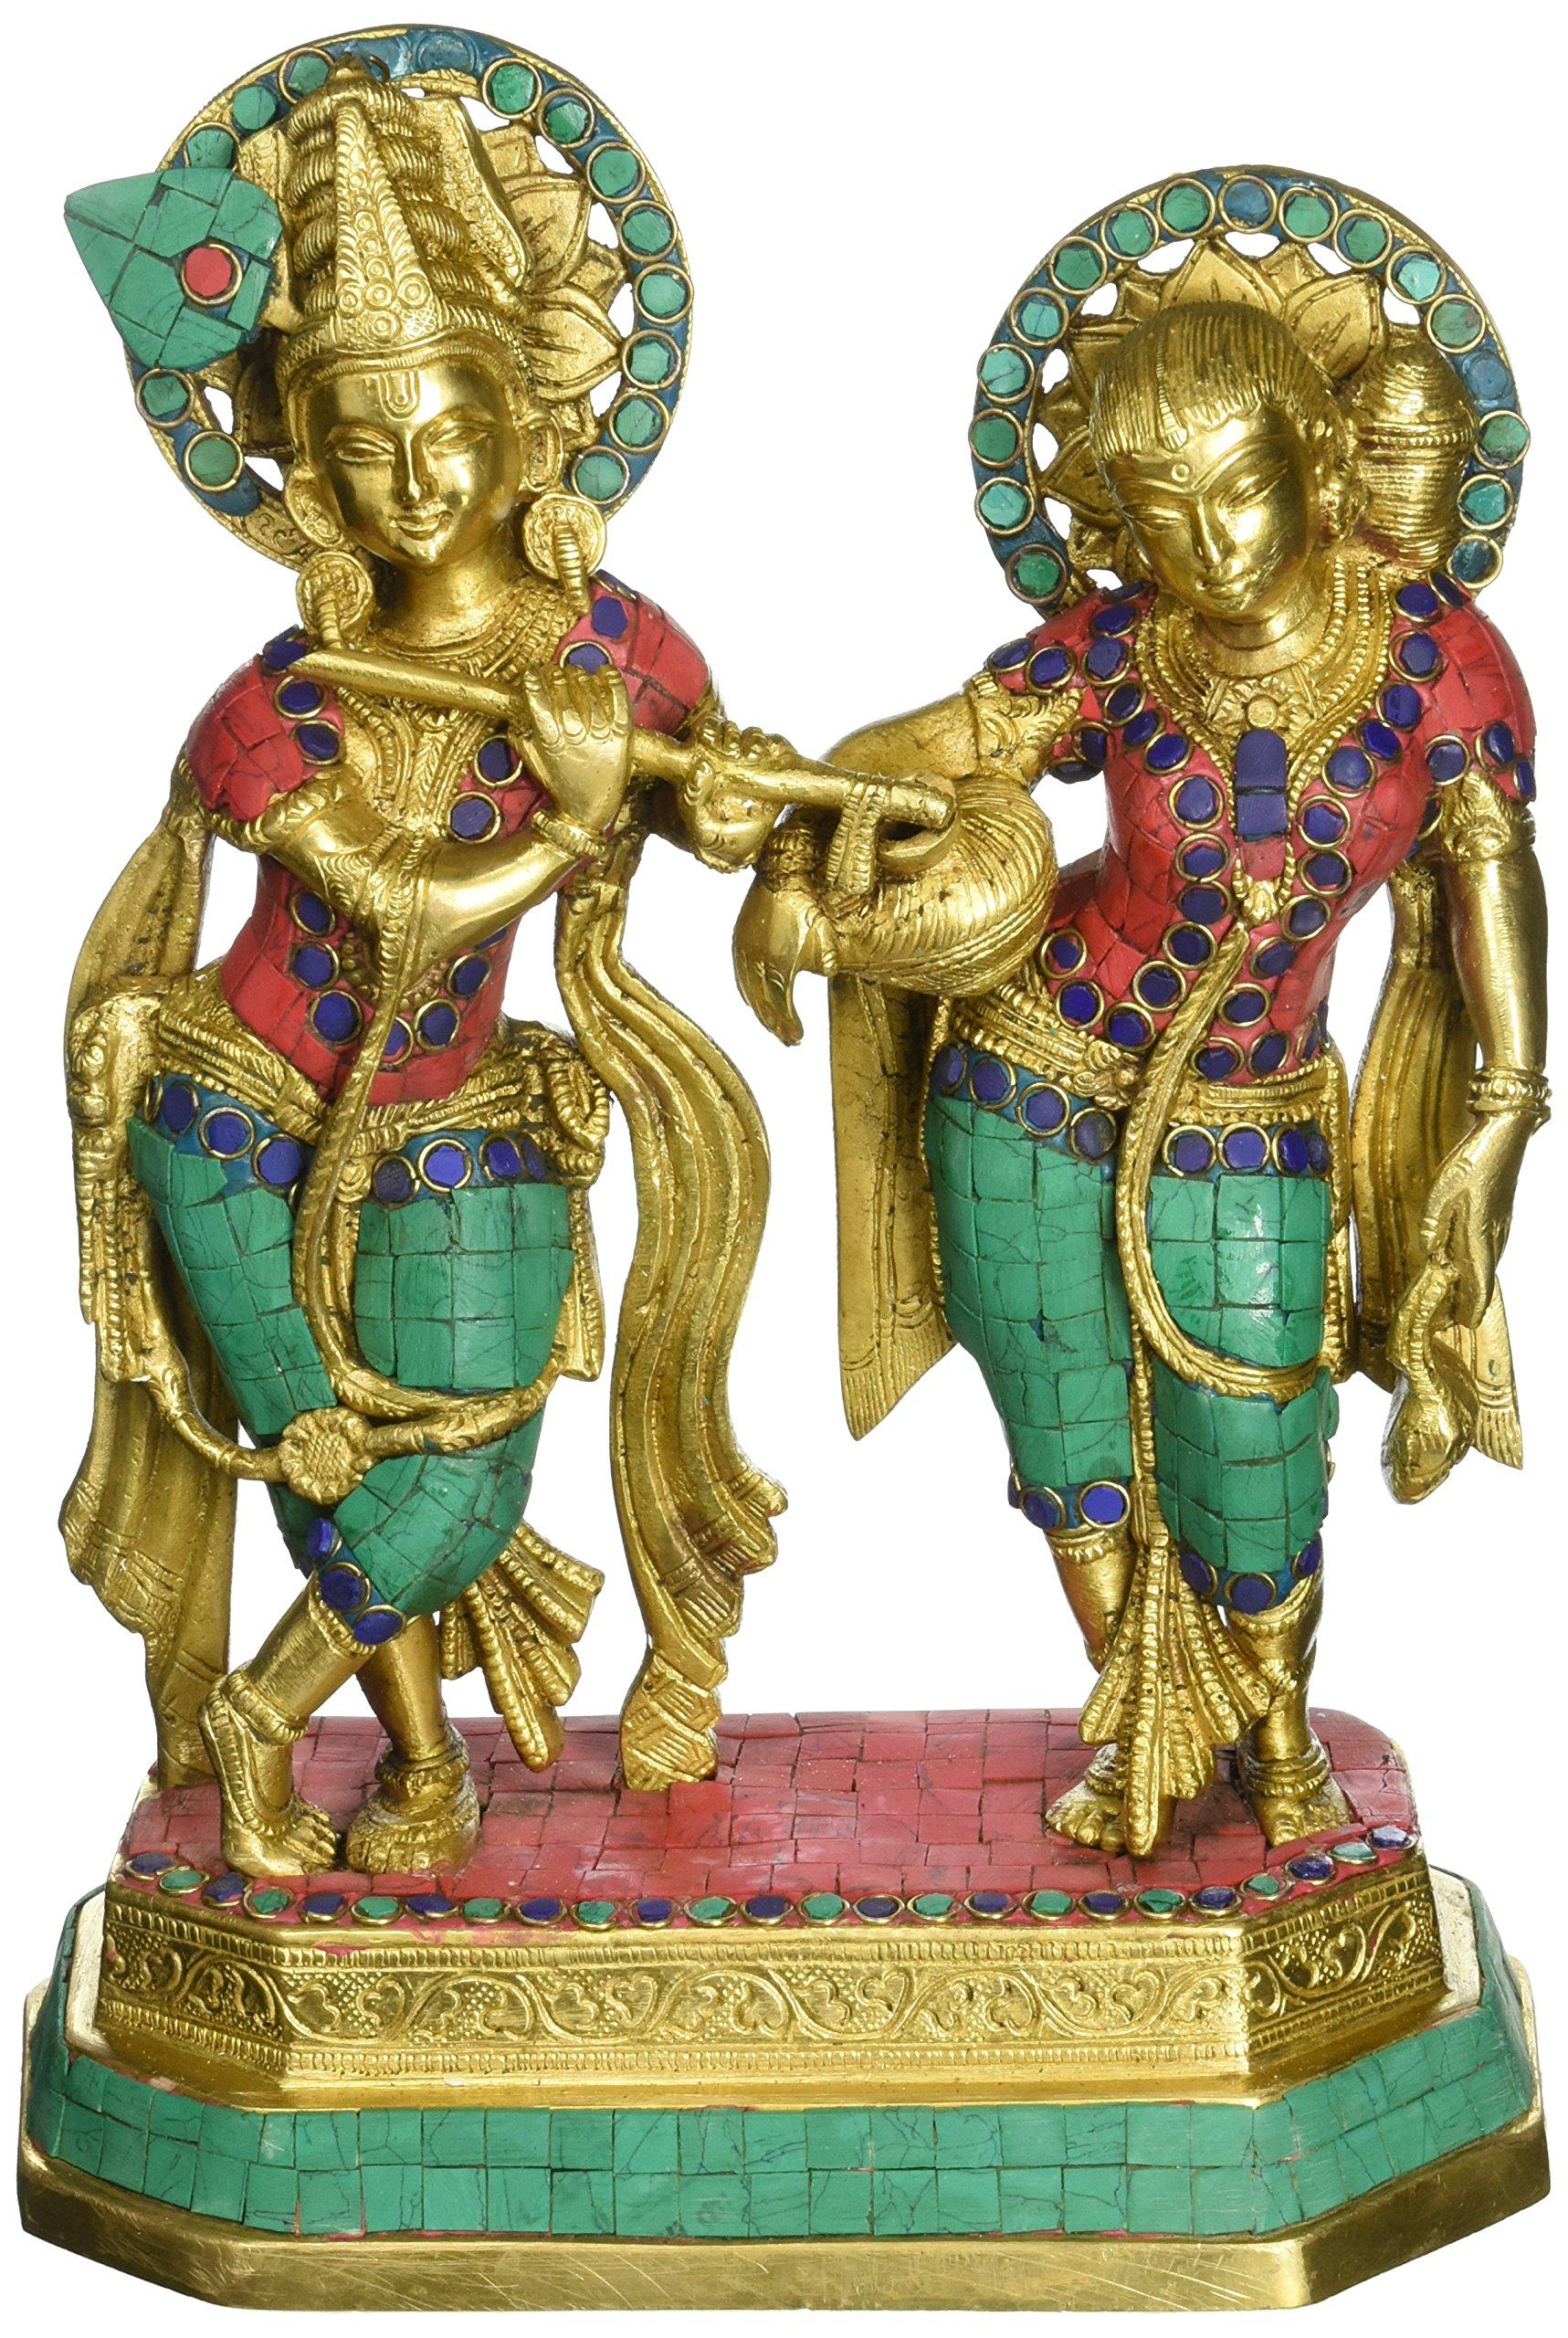 AapnoCraft Large Standing Radha Krishna Statue - Exquisite Divine Couple Radha Krishna Idols Symbol of Love Sculpture Wedding Gifts by AapnoCraft (Image #1)